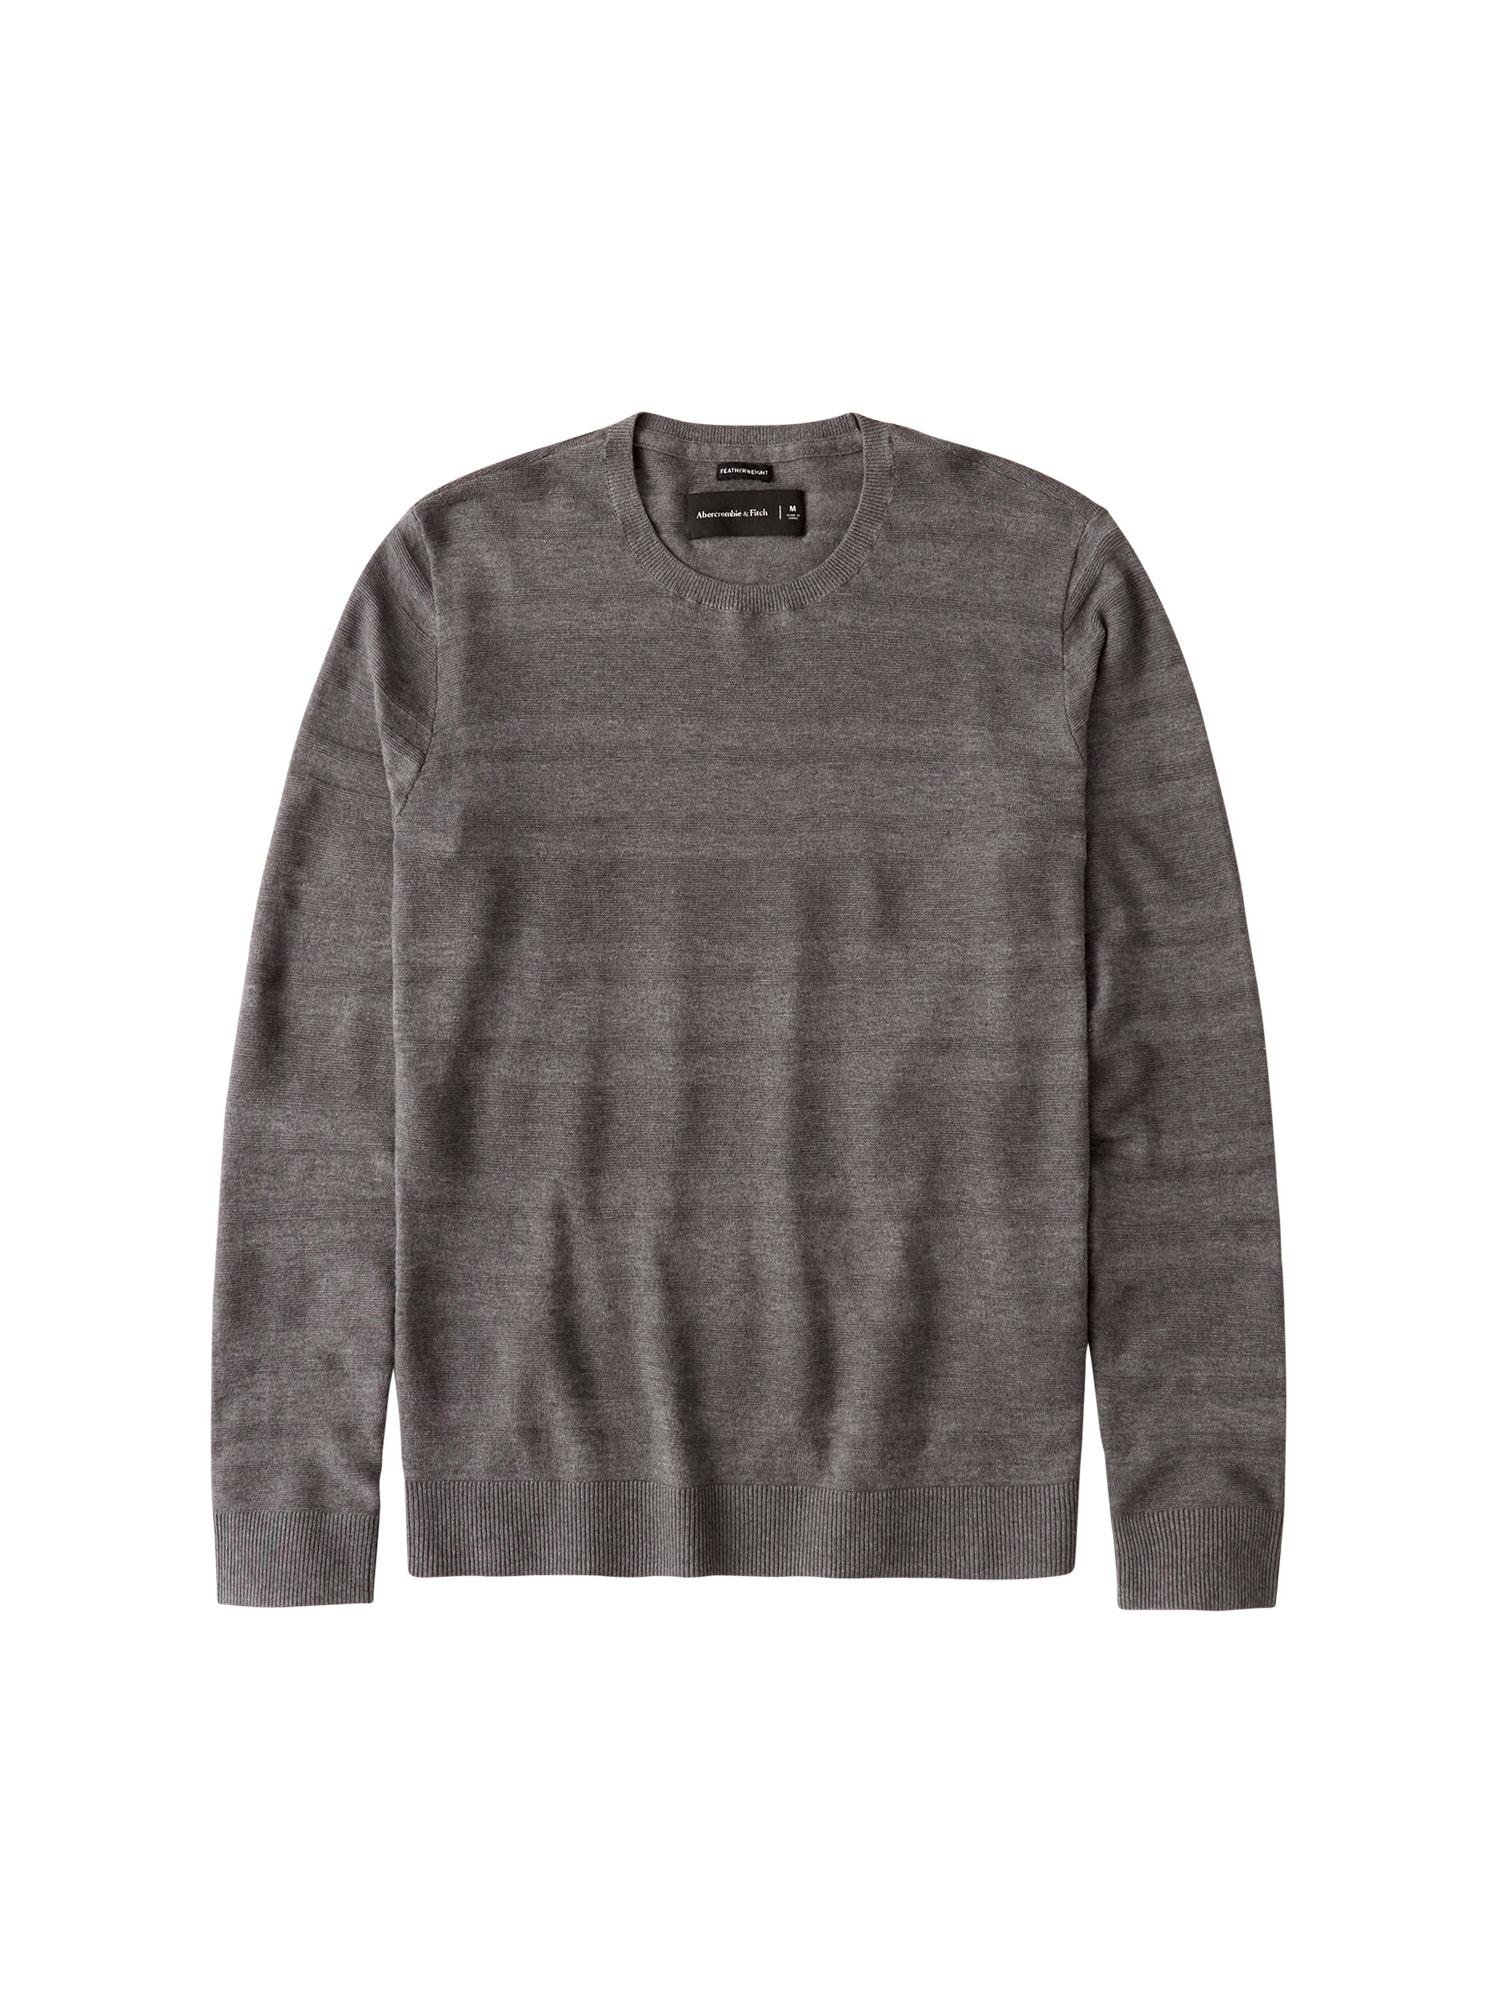 Abercrombie & Fitch Megztinis pilka